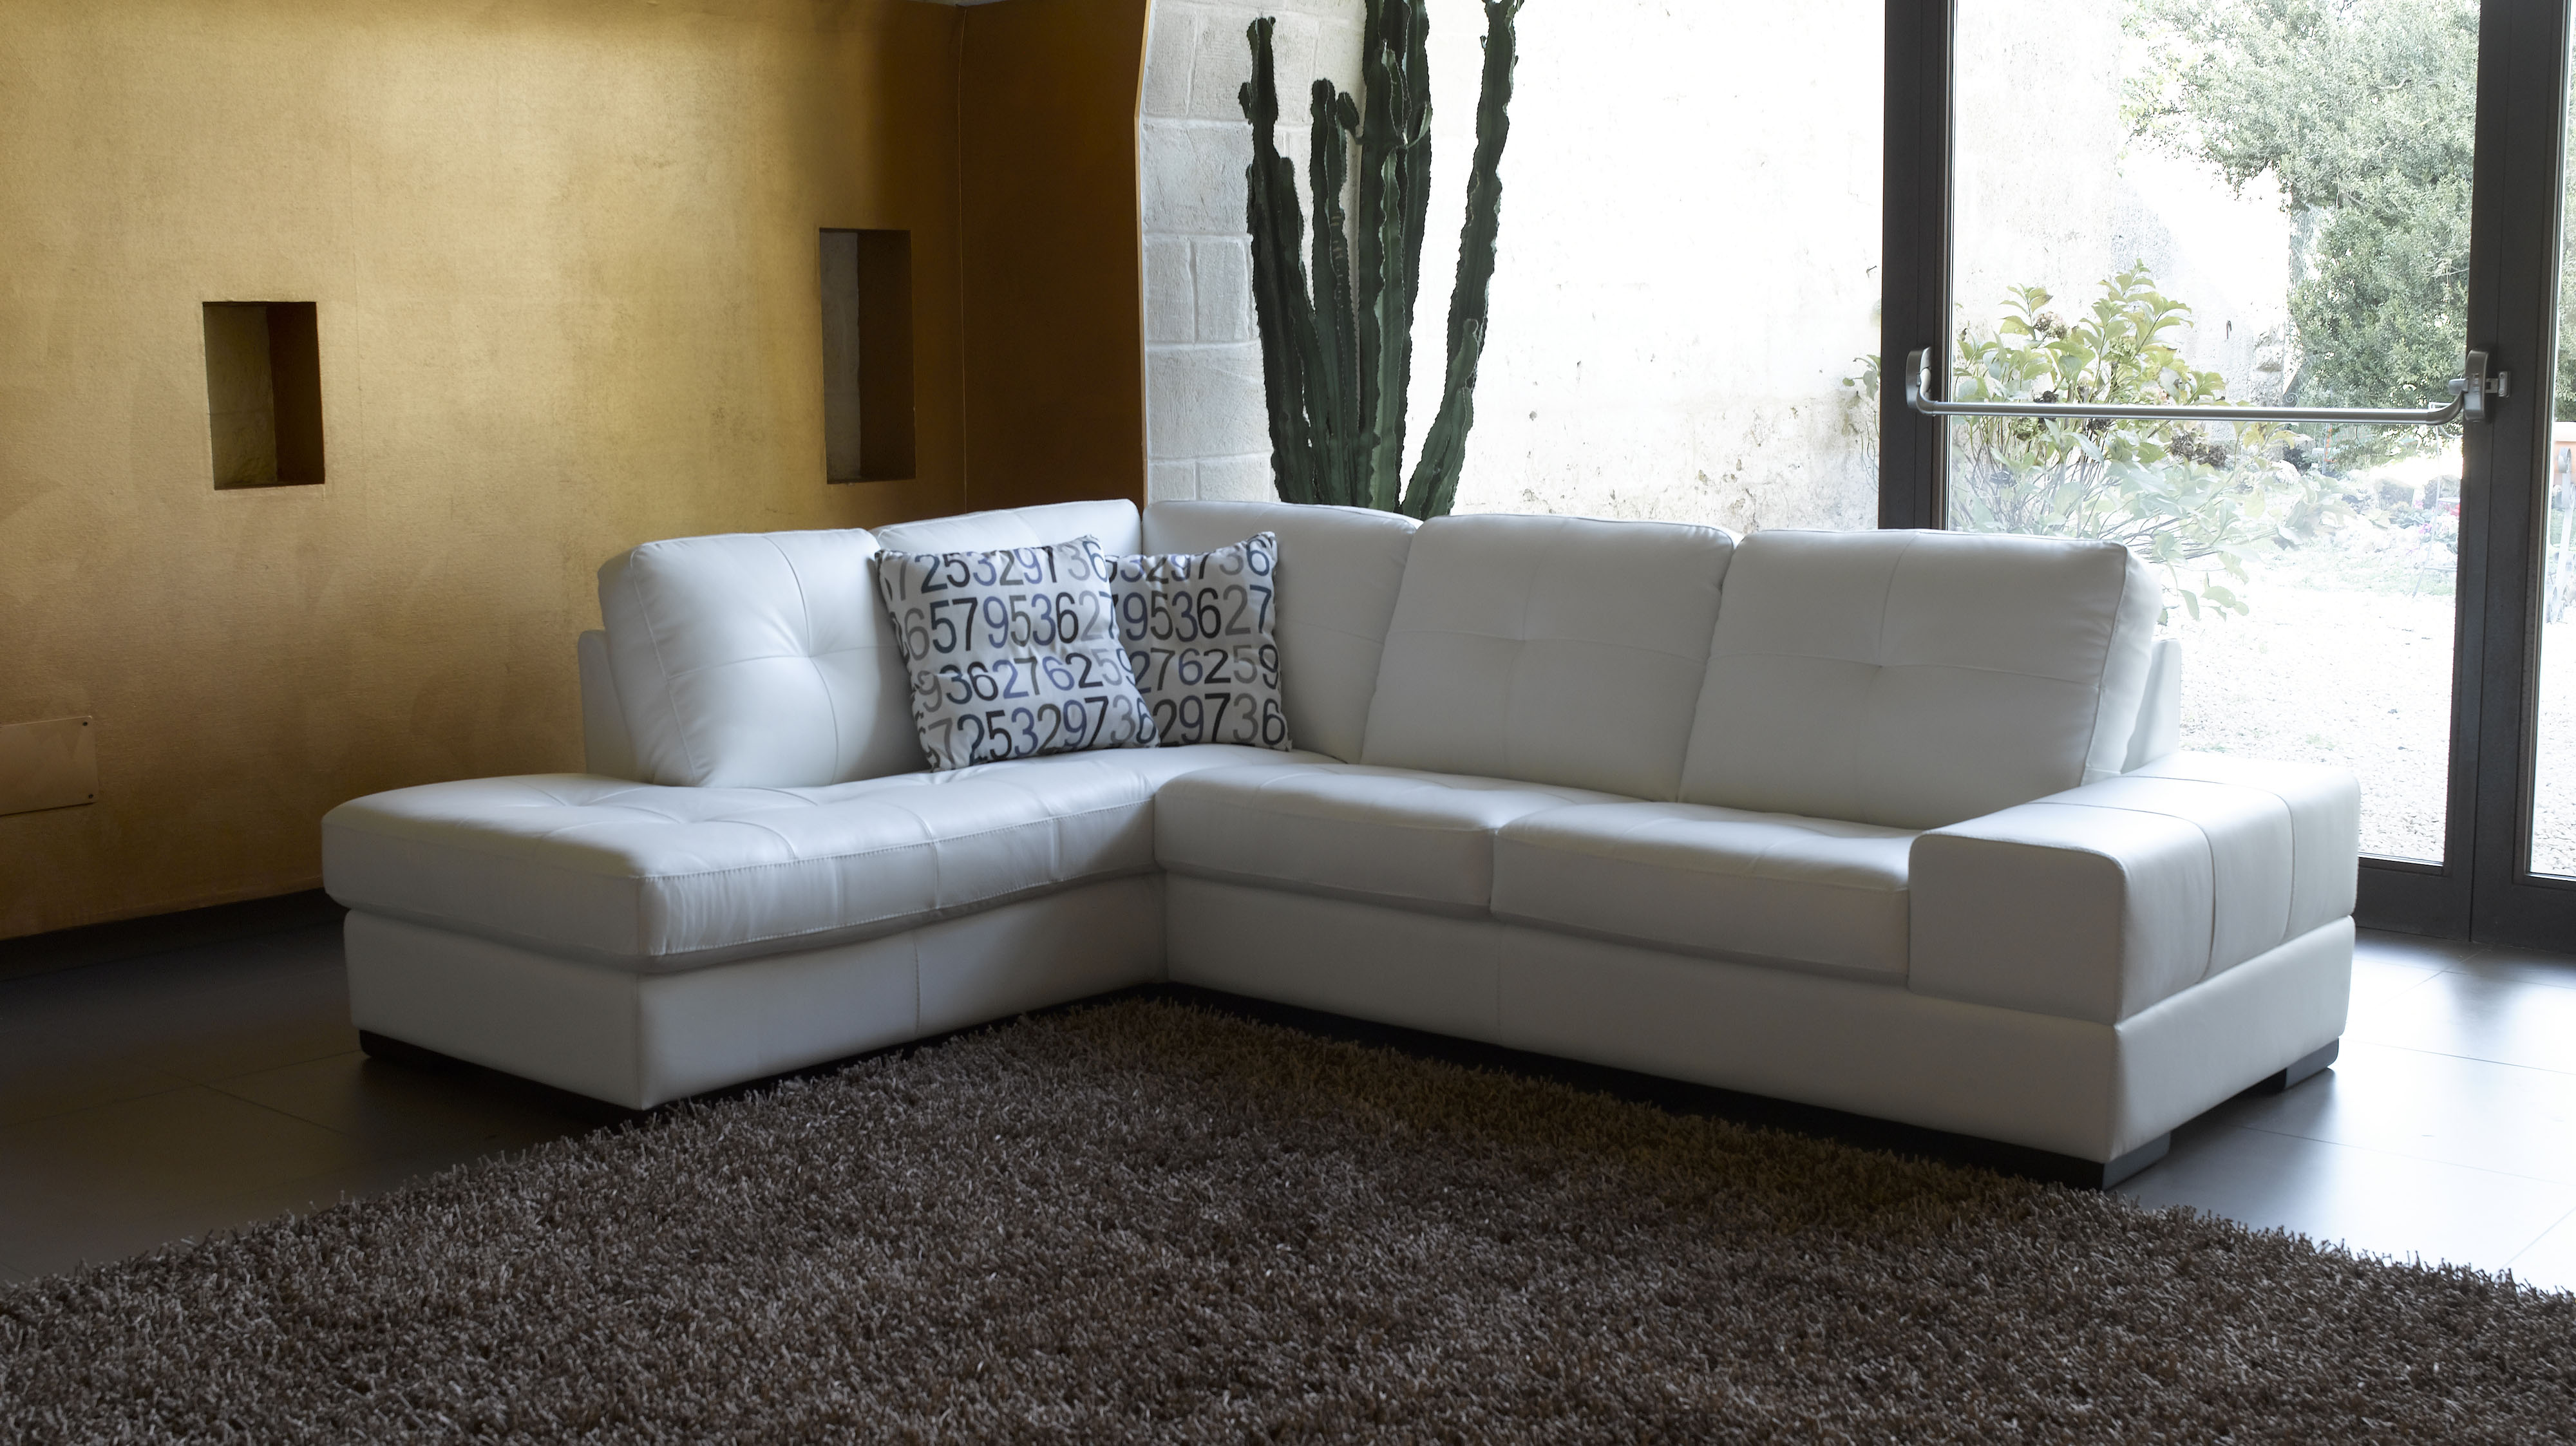 Overnice Genuine Leather Sectional Tucson Arizona Antonio